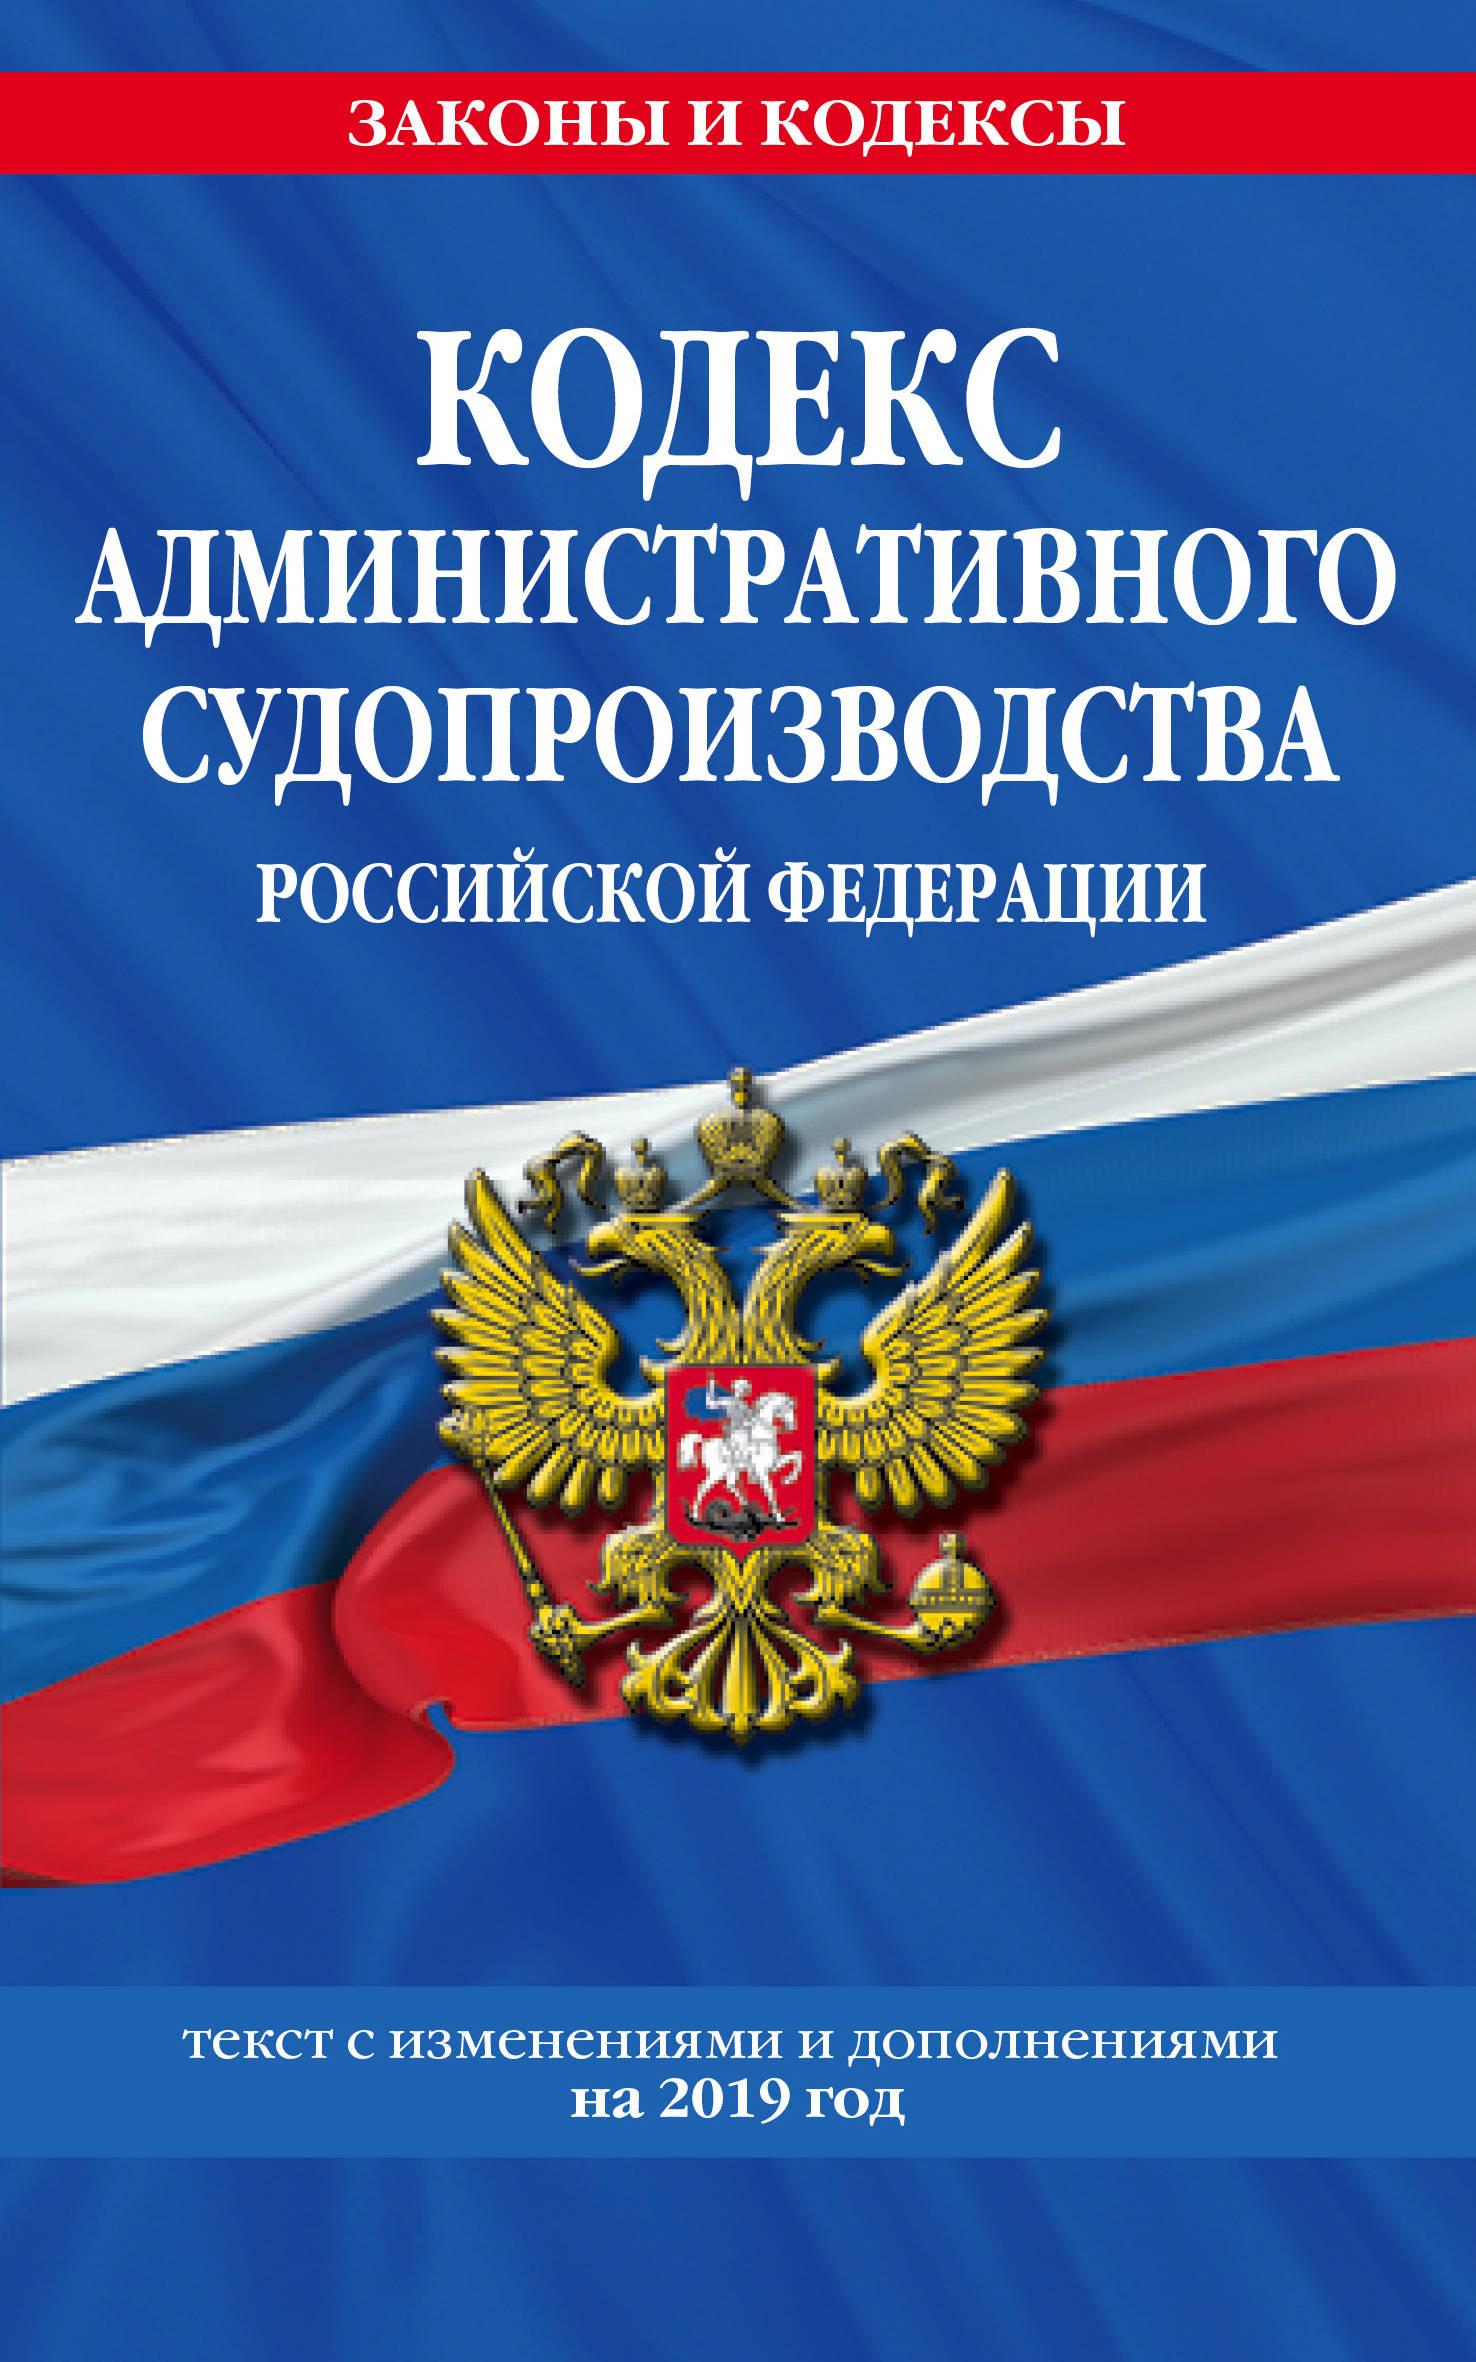 Кодекс административного судопроизводства РФ: текст с посл. изм. на 2019 г.